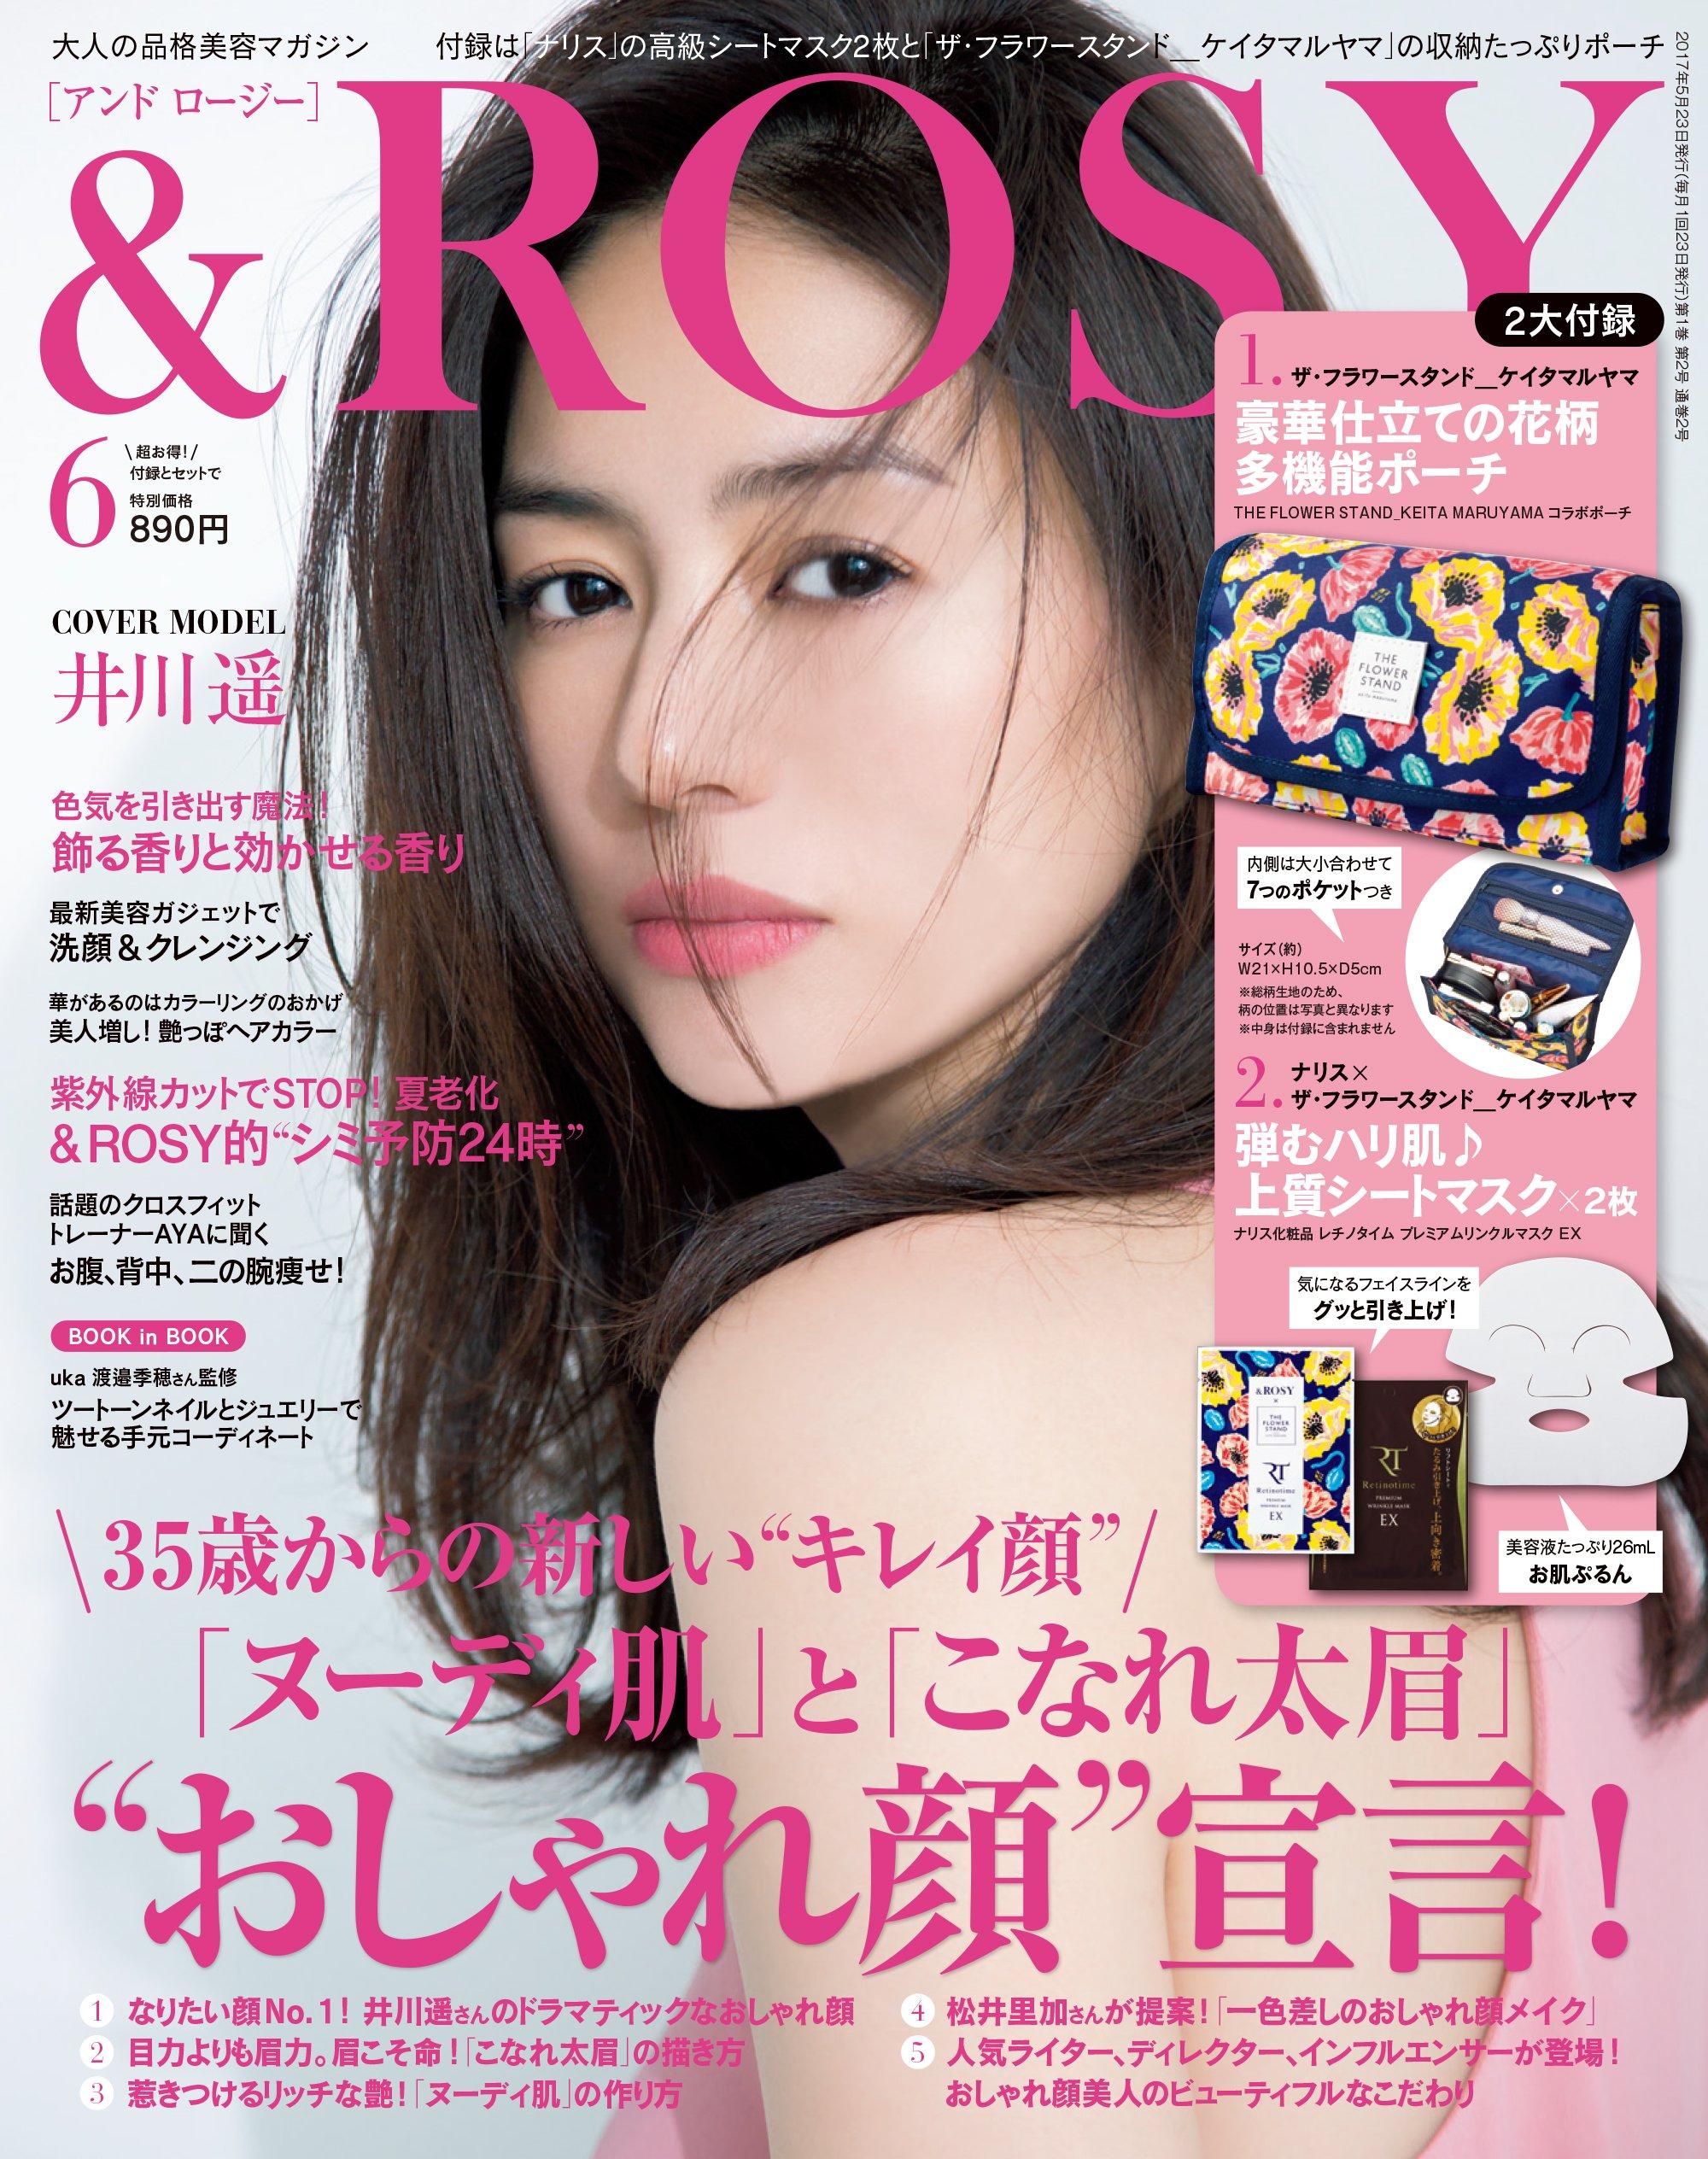 &ROSY 2017年6月号 大きい表紙画像